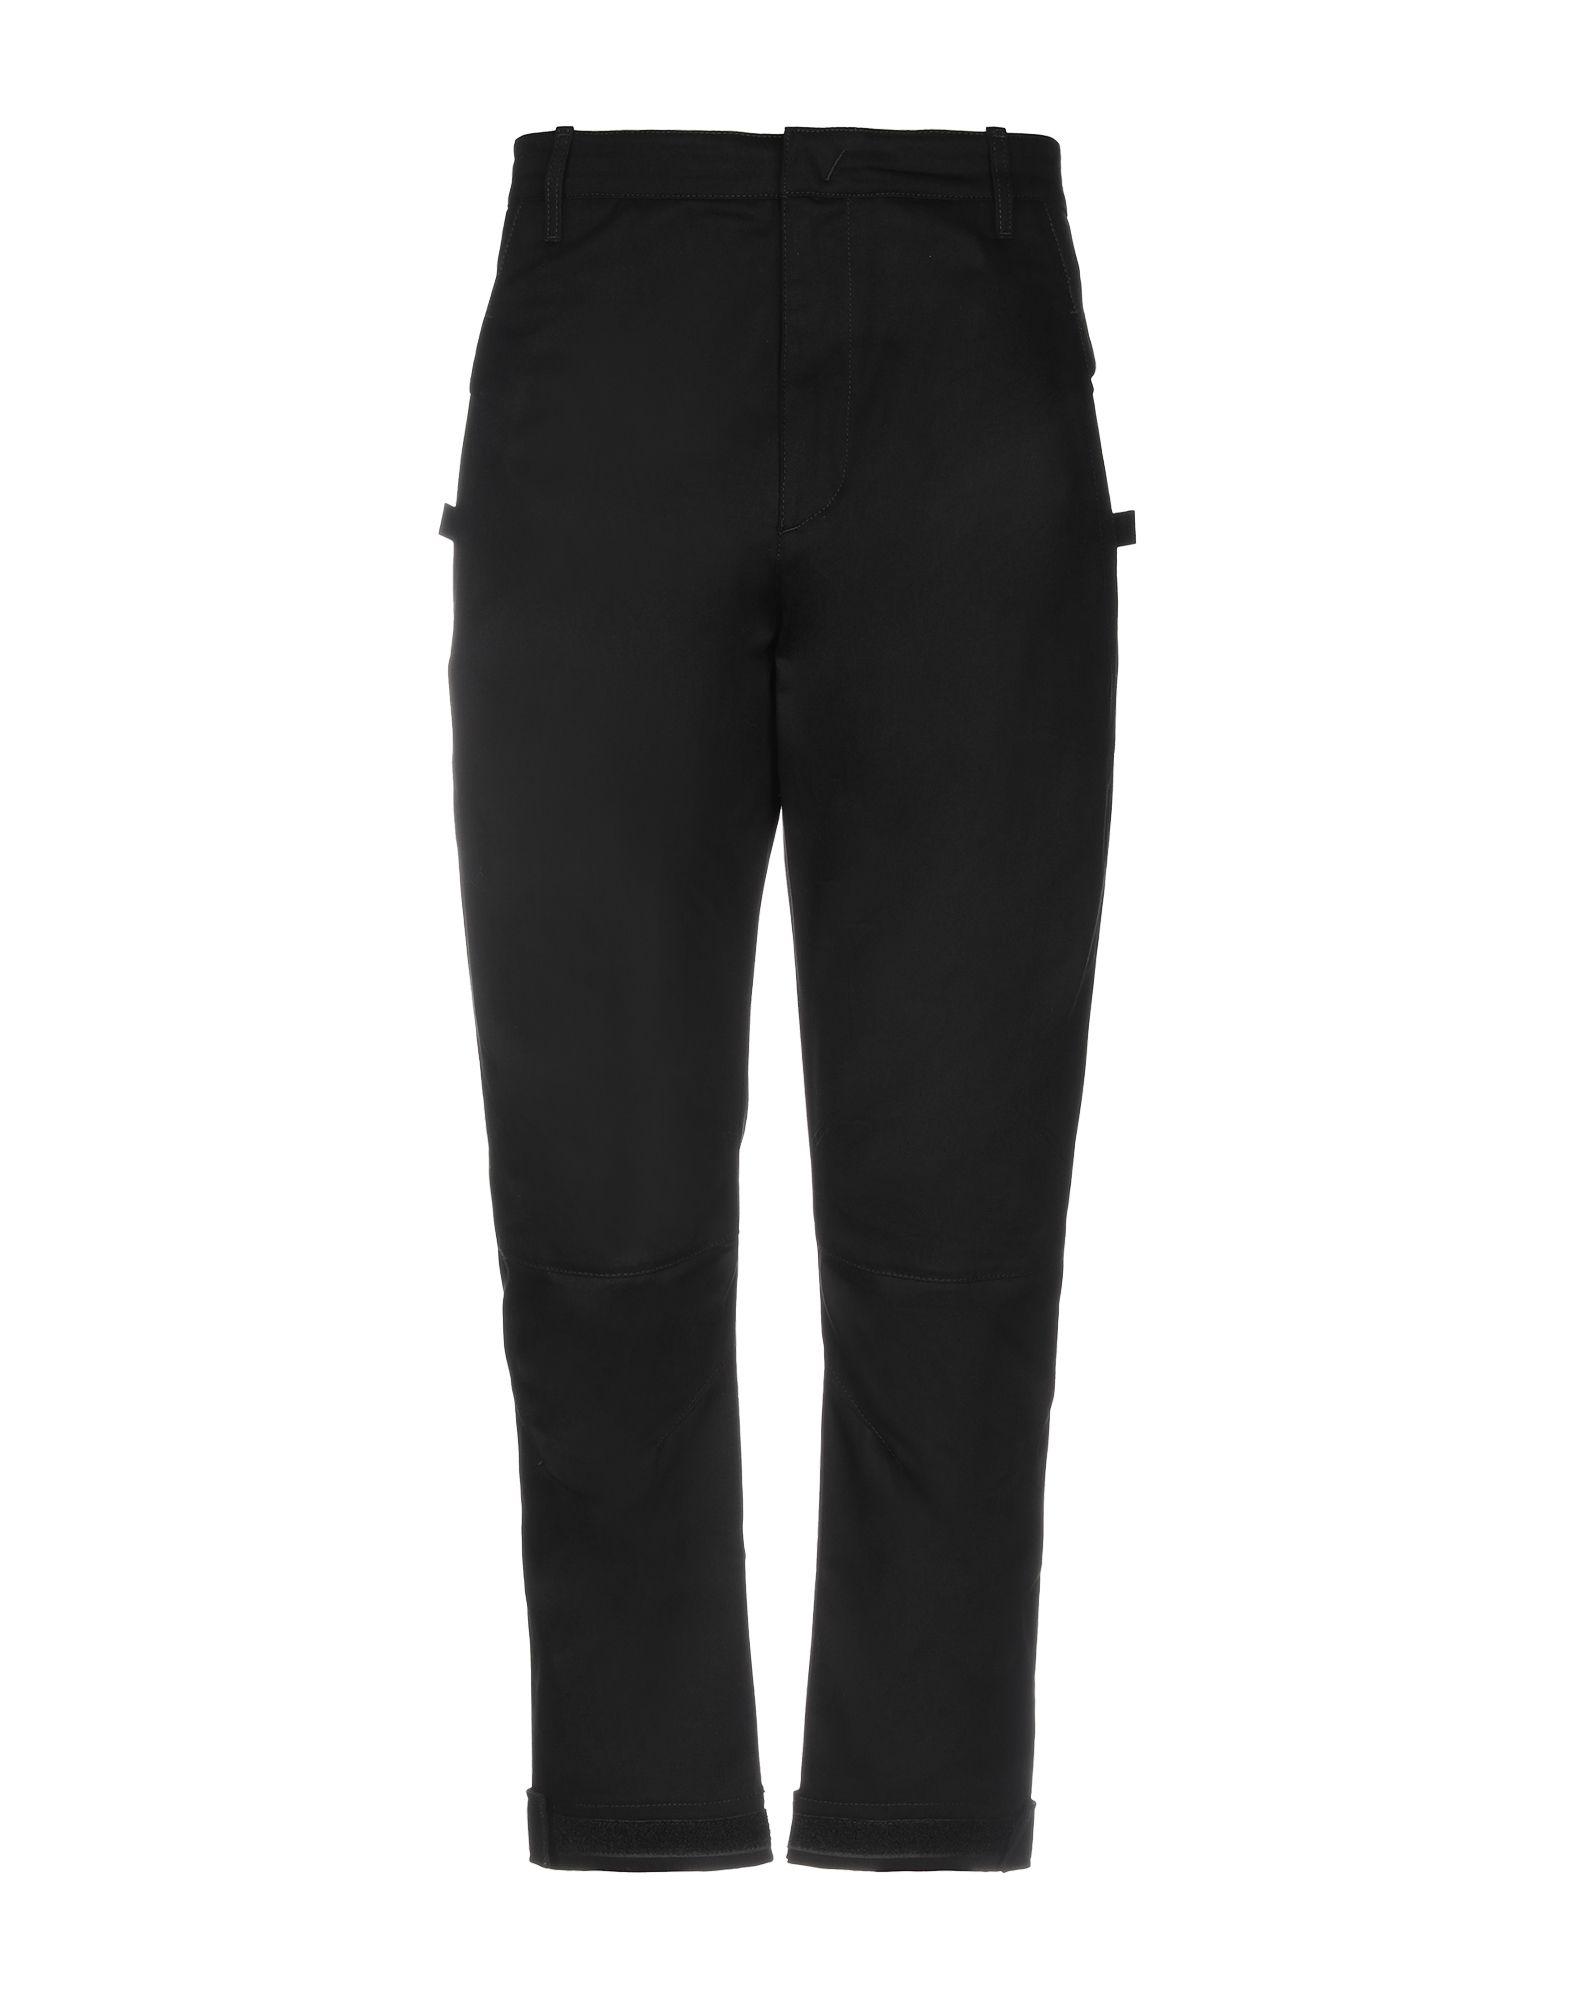 Pantalone Marcelo Burlon uomo uomo - 13248523BP  am meisten bevorzugt